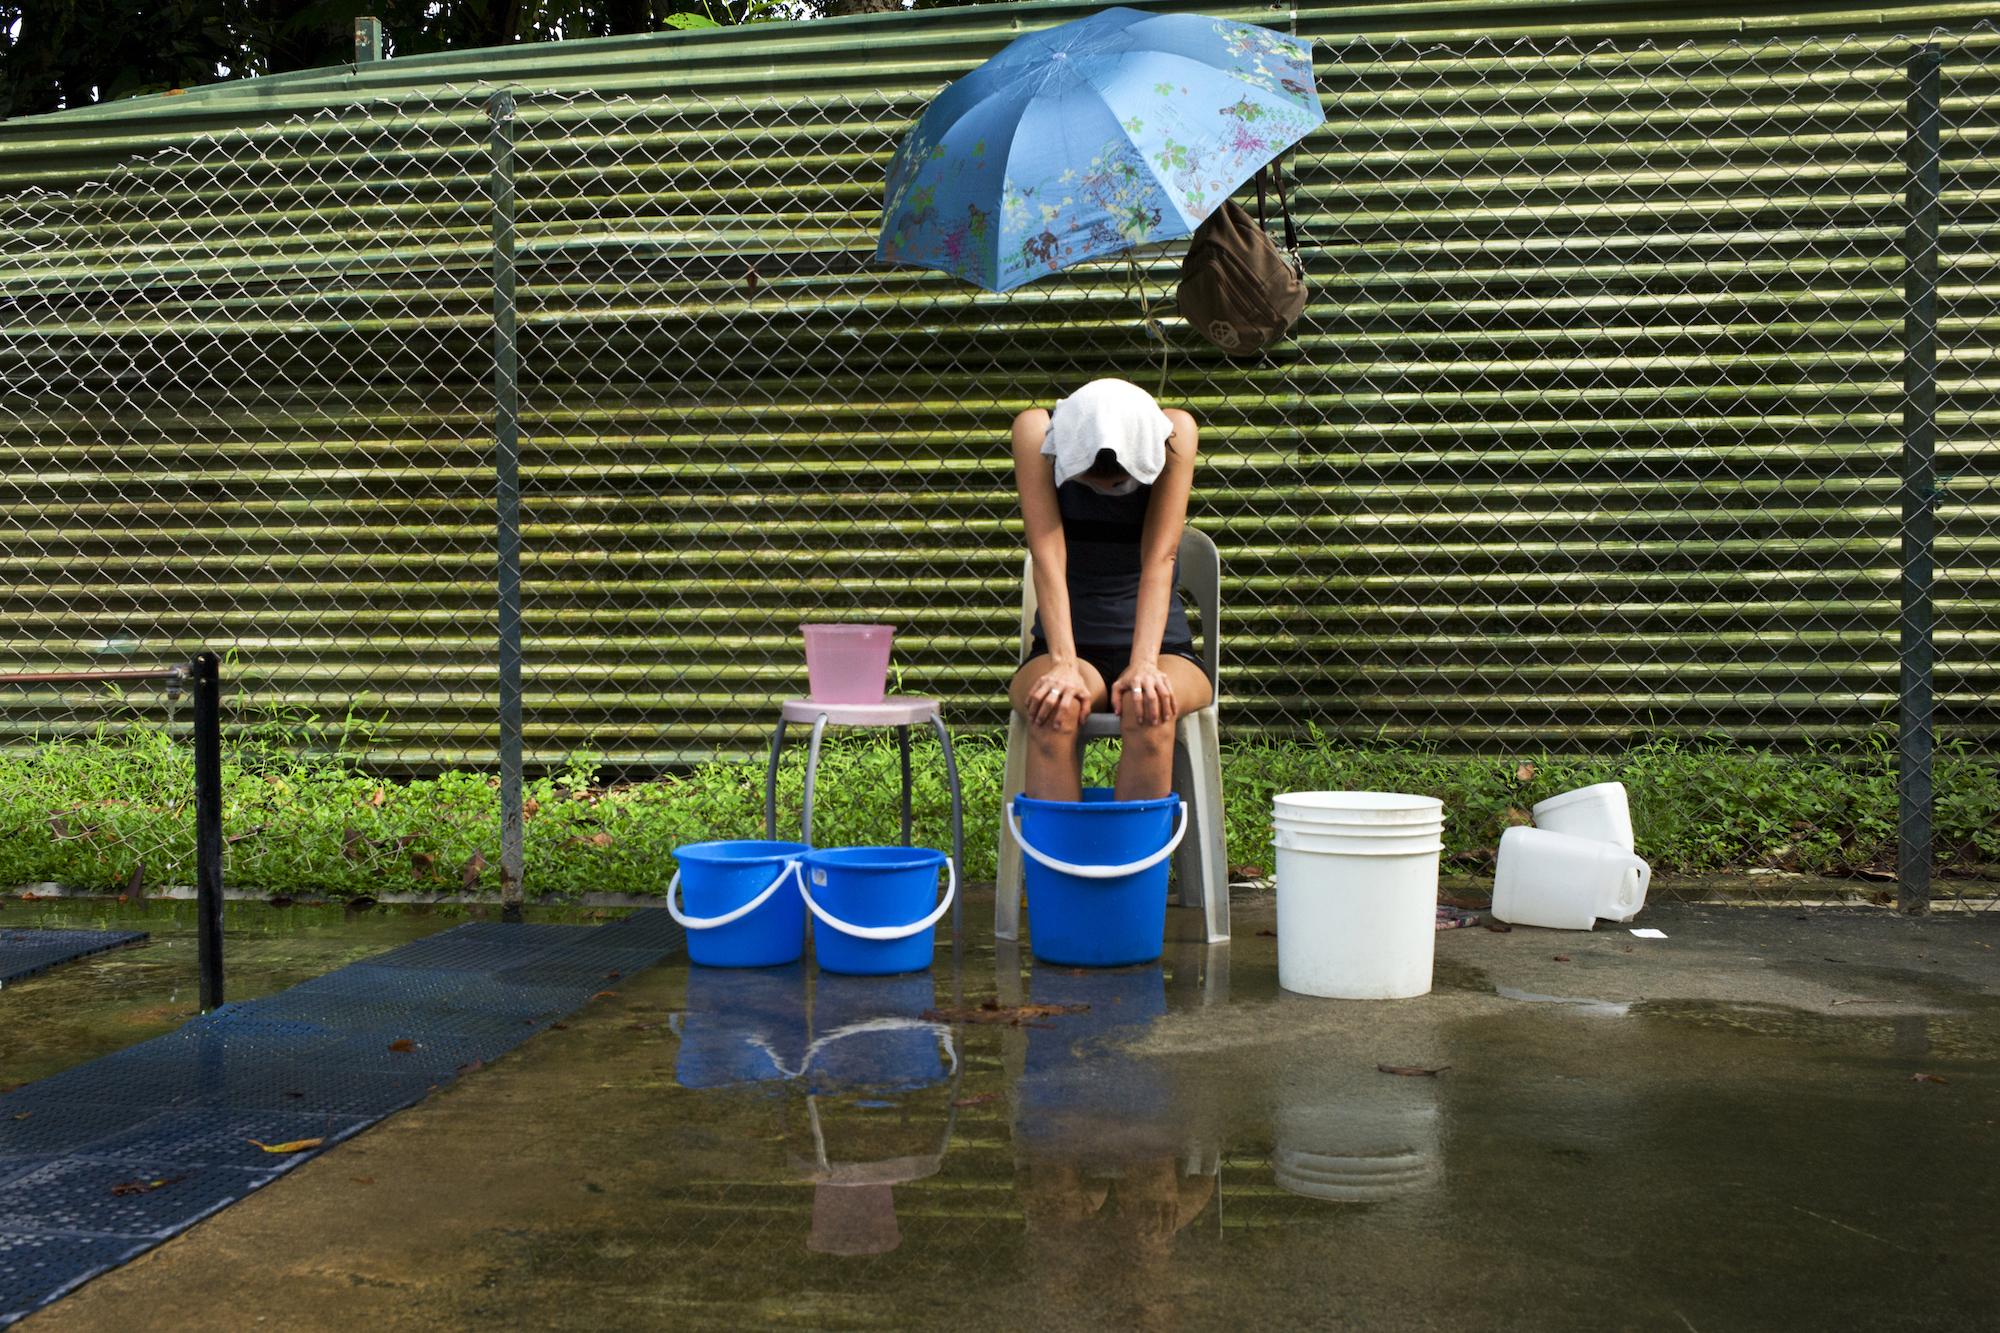 Marika Poquet - Unexpected Singapore S13